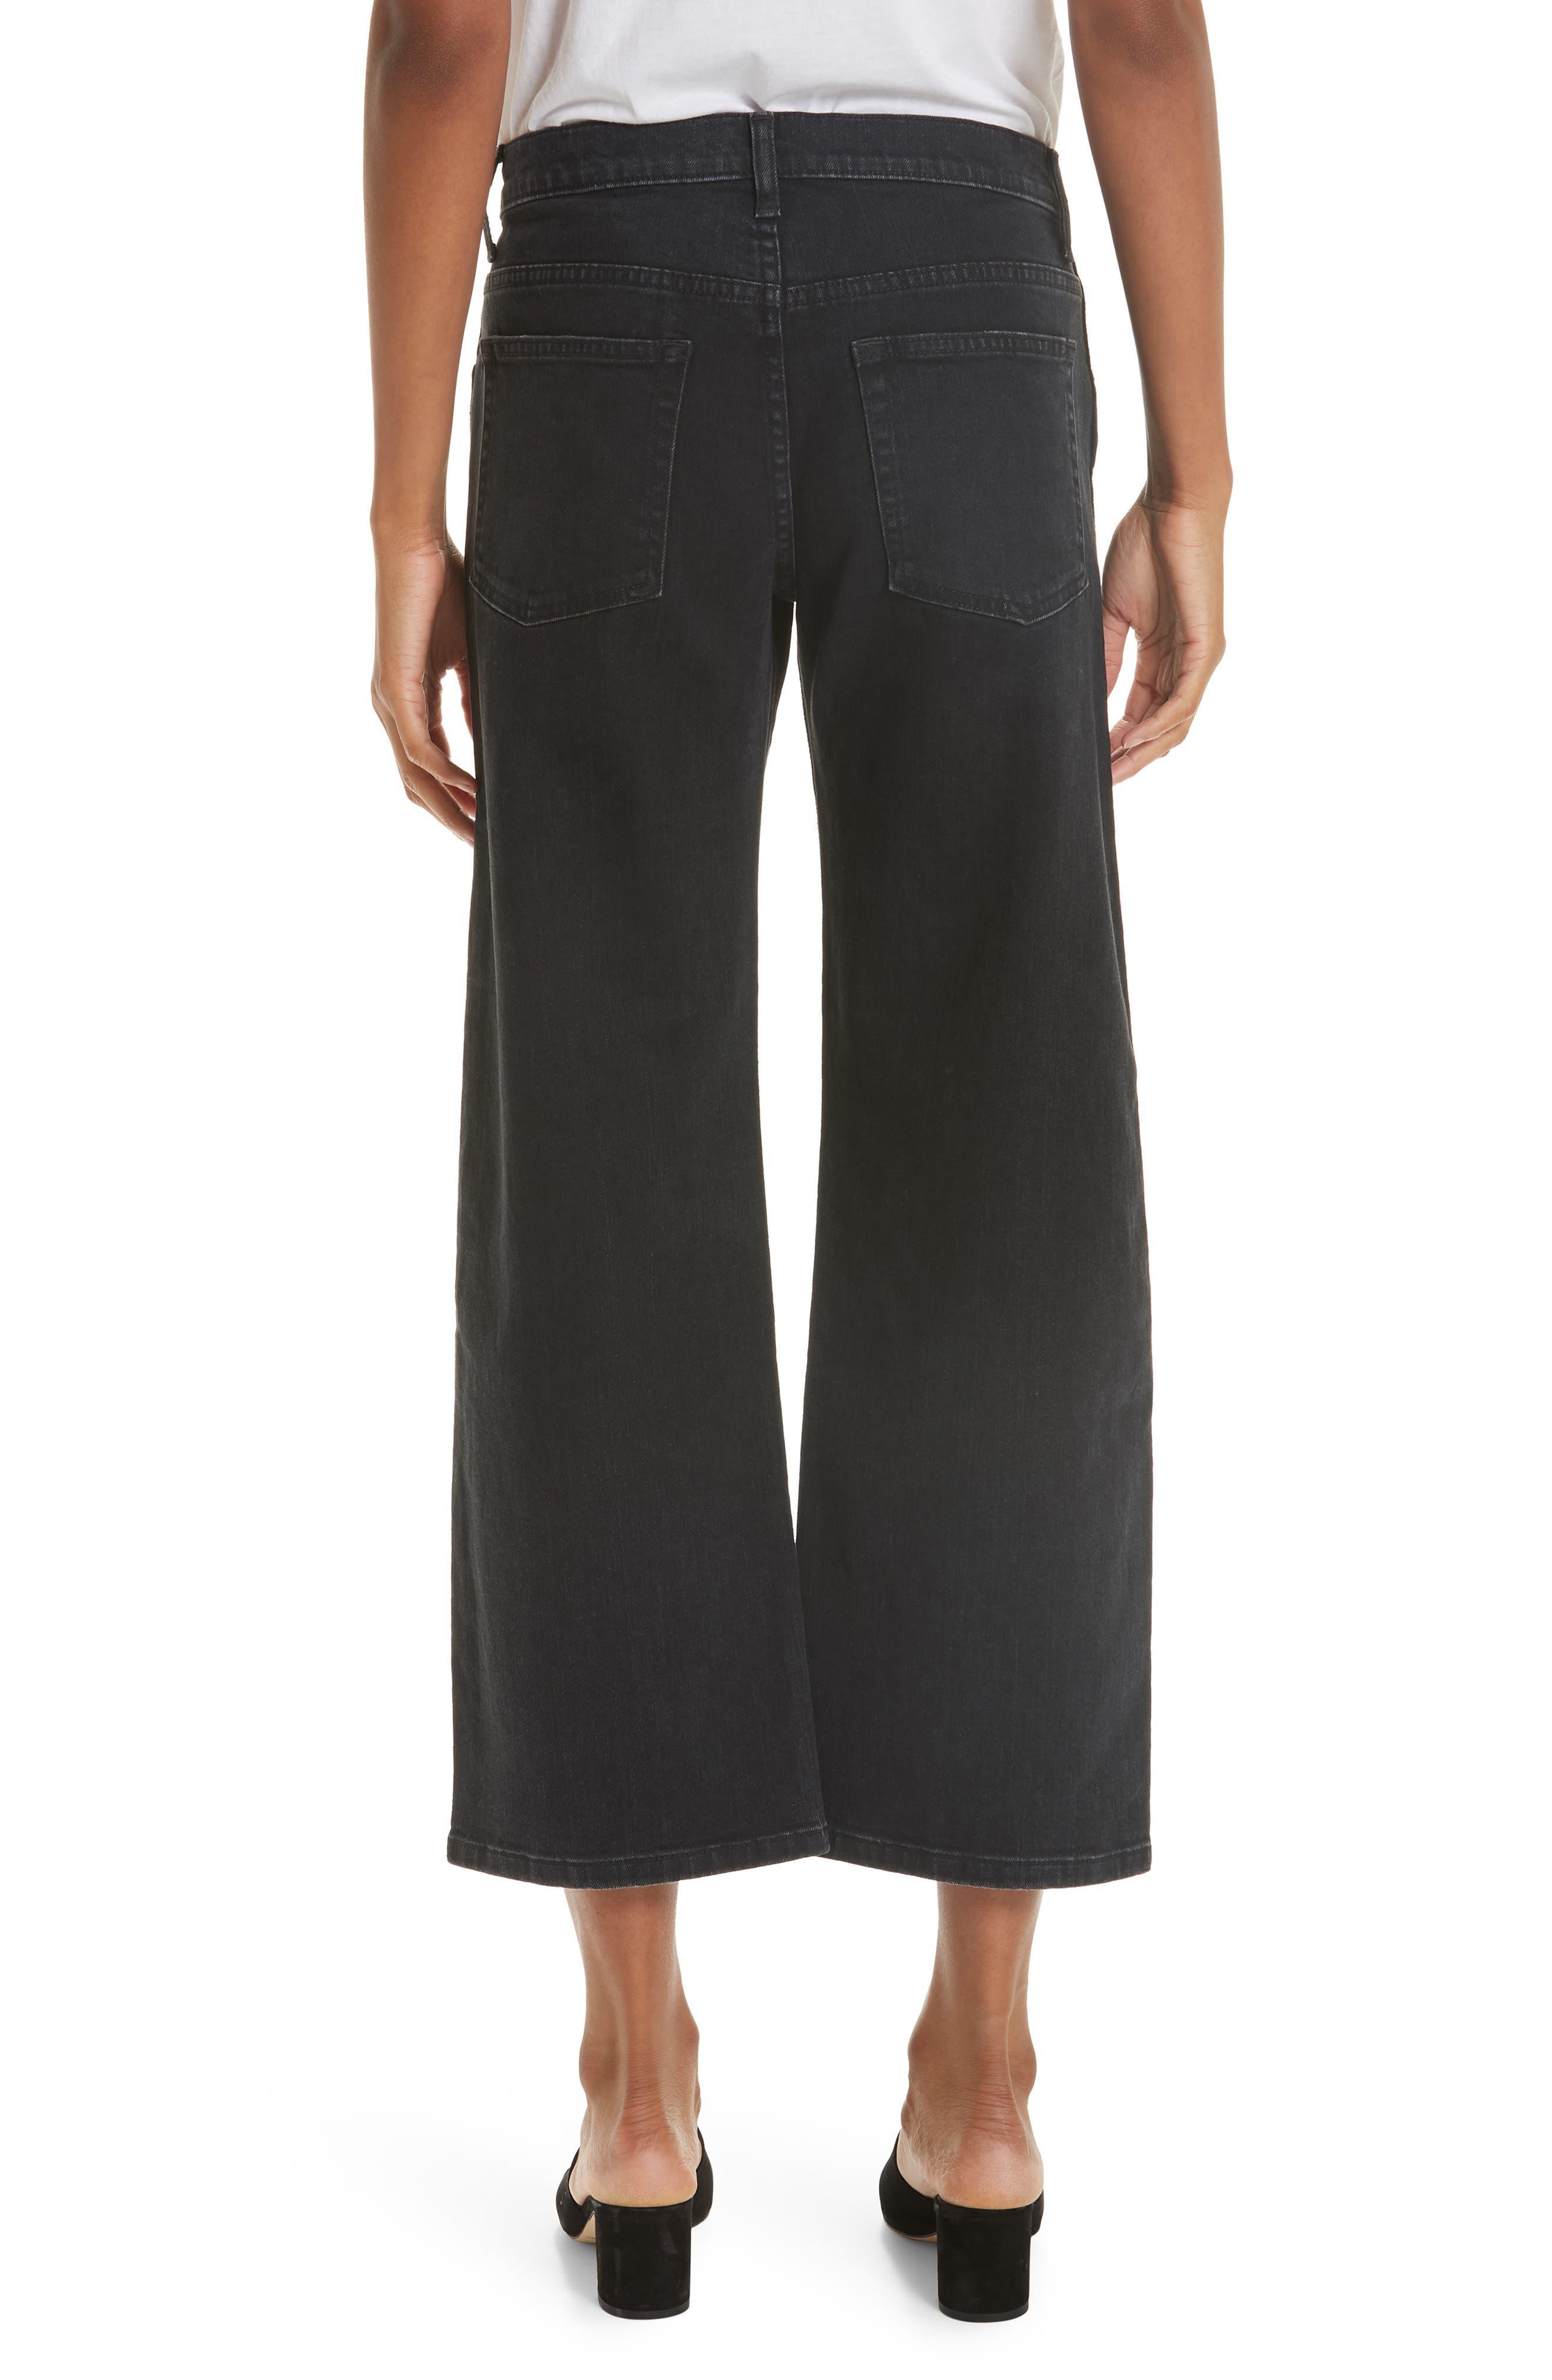 KHAITE,                             Wendell Wide Leg Crop Jeans,                             Alternate thumbnail 2, color,                             STONED BLACK